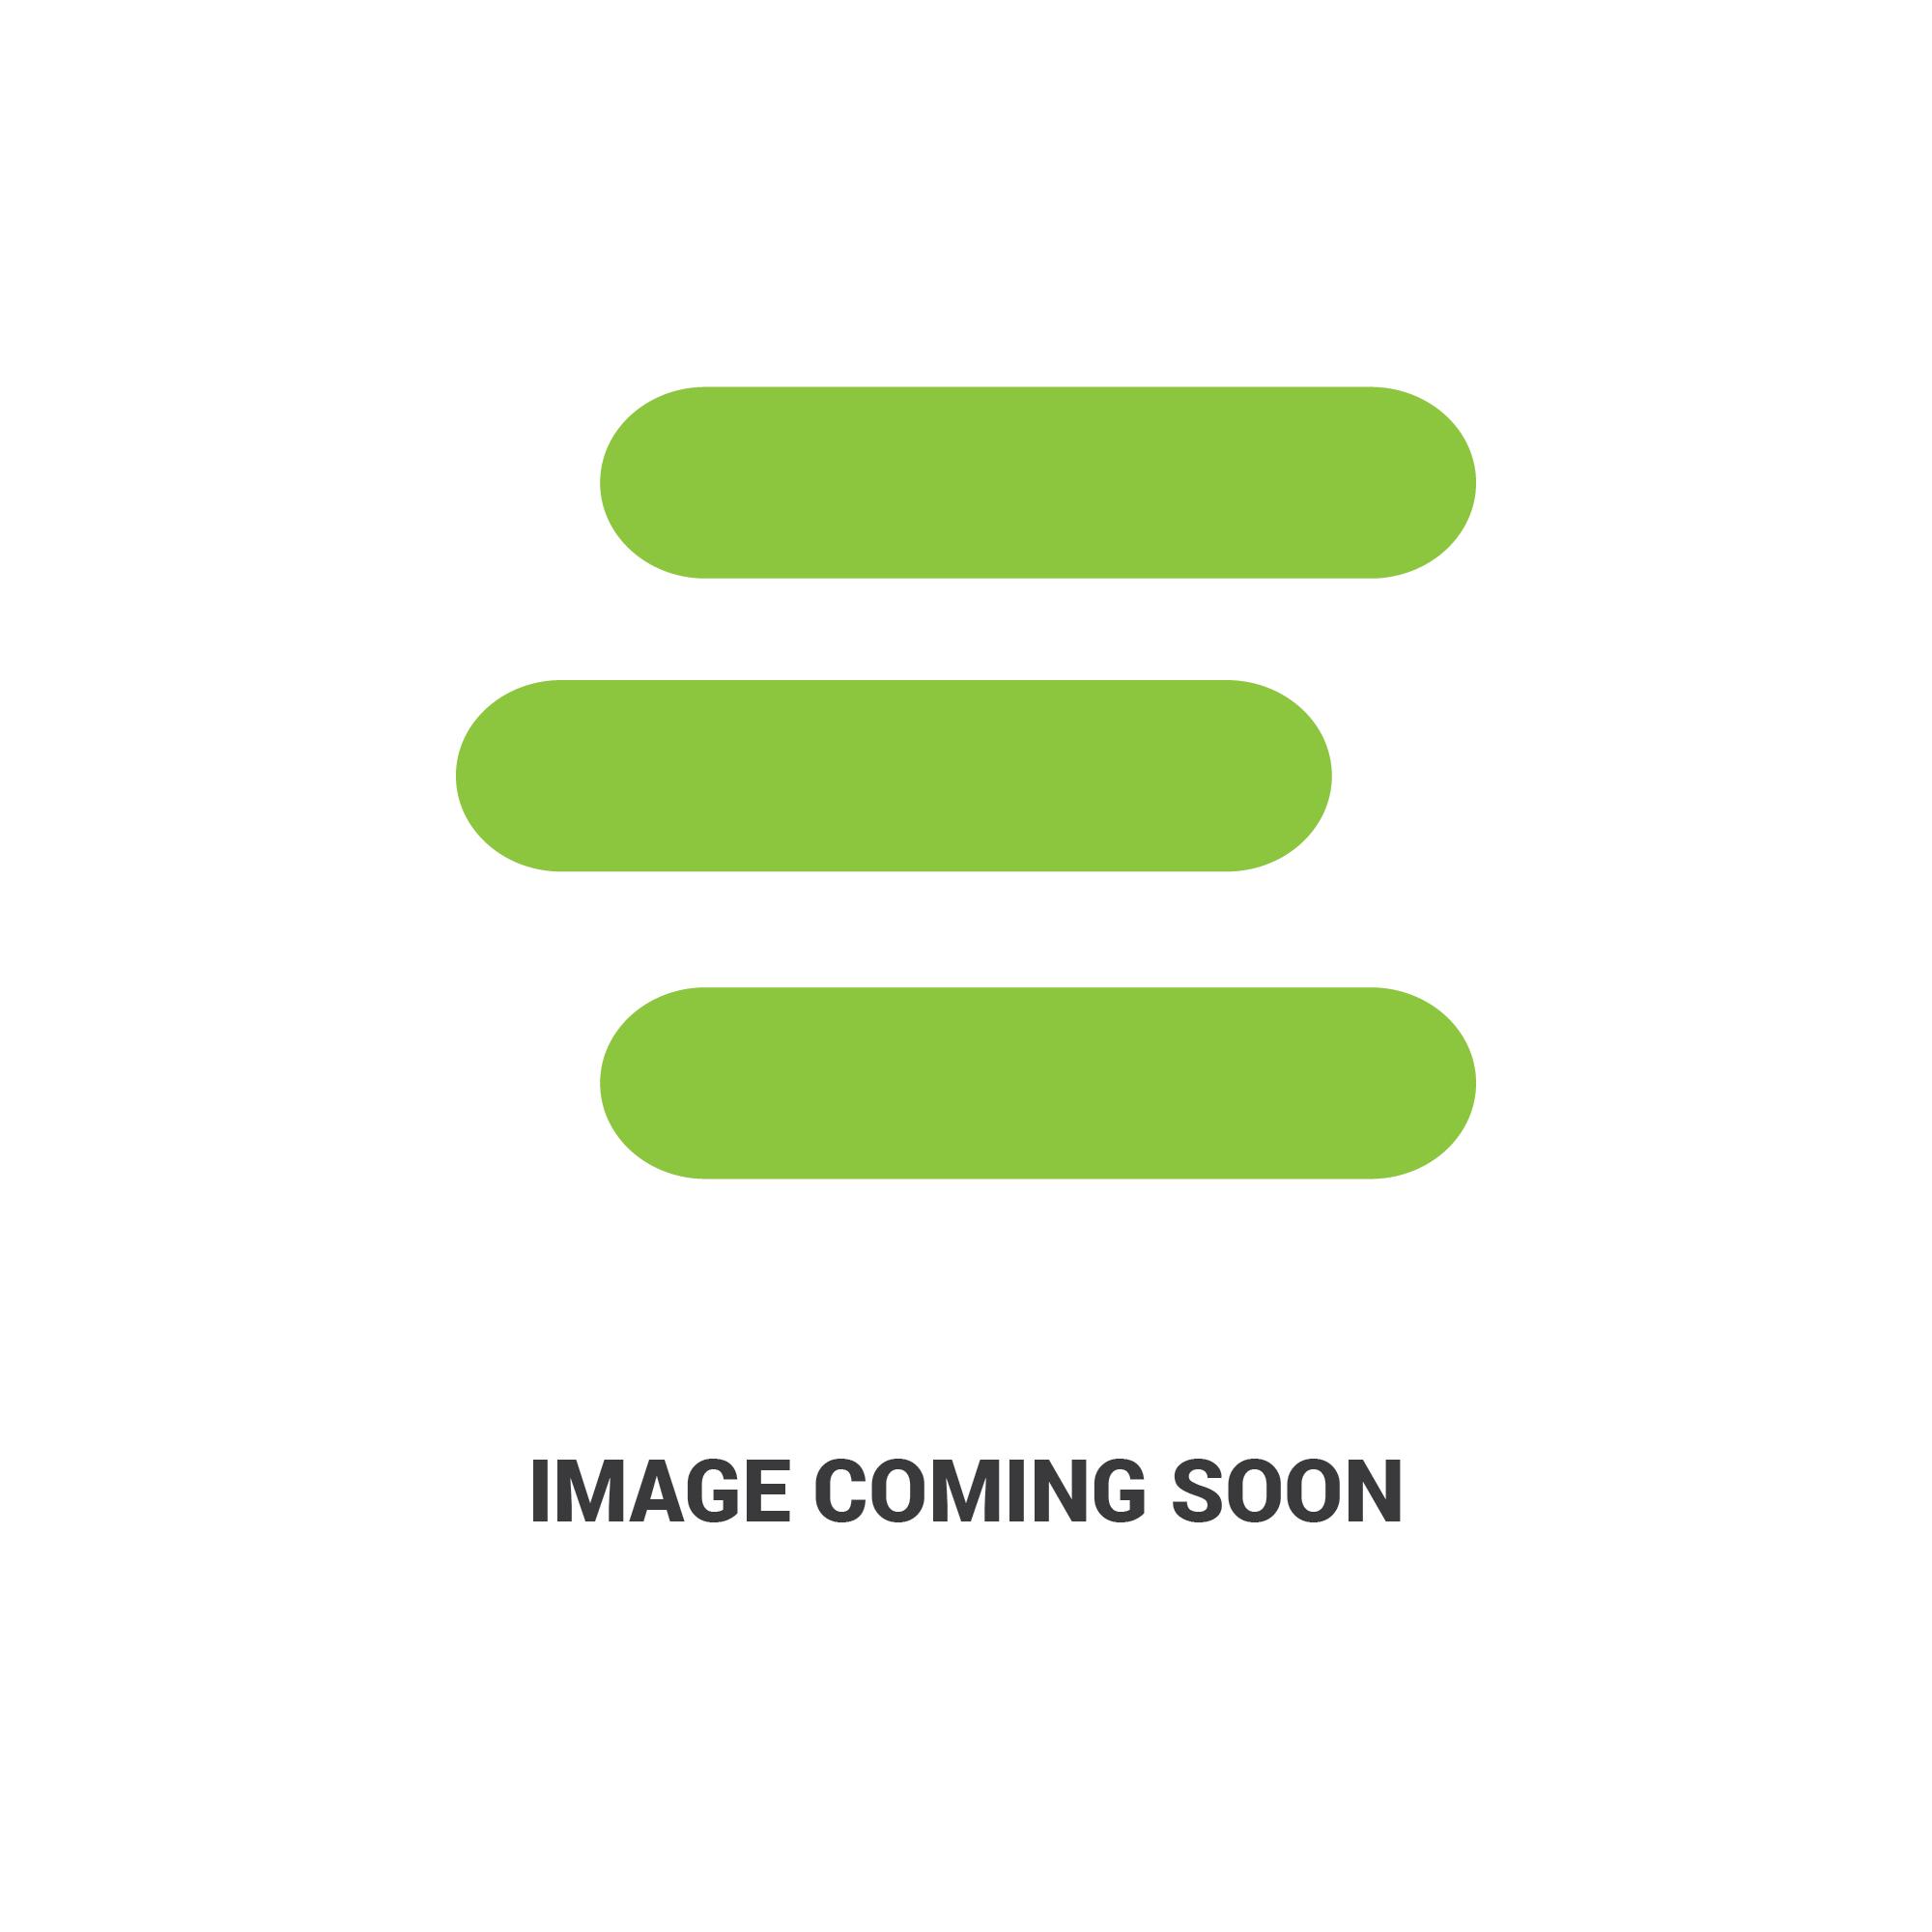 E-71820C911675_1.jpg